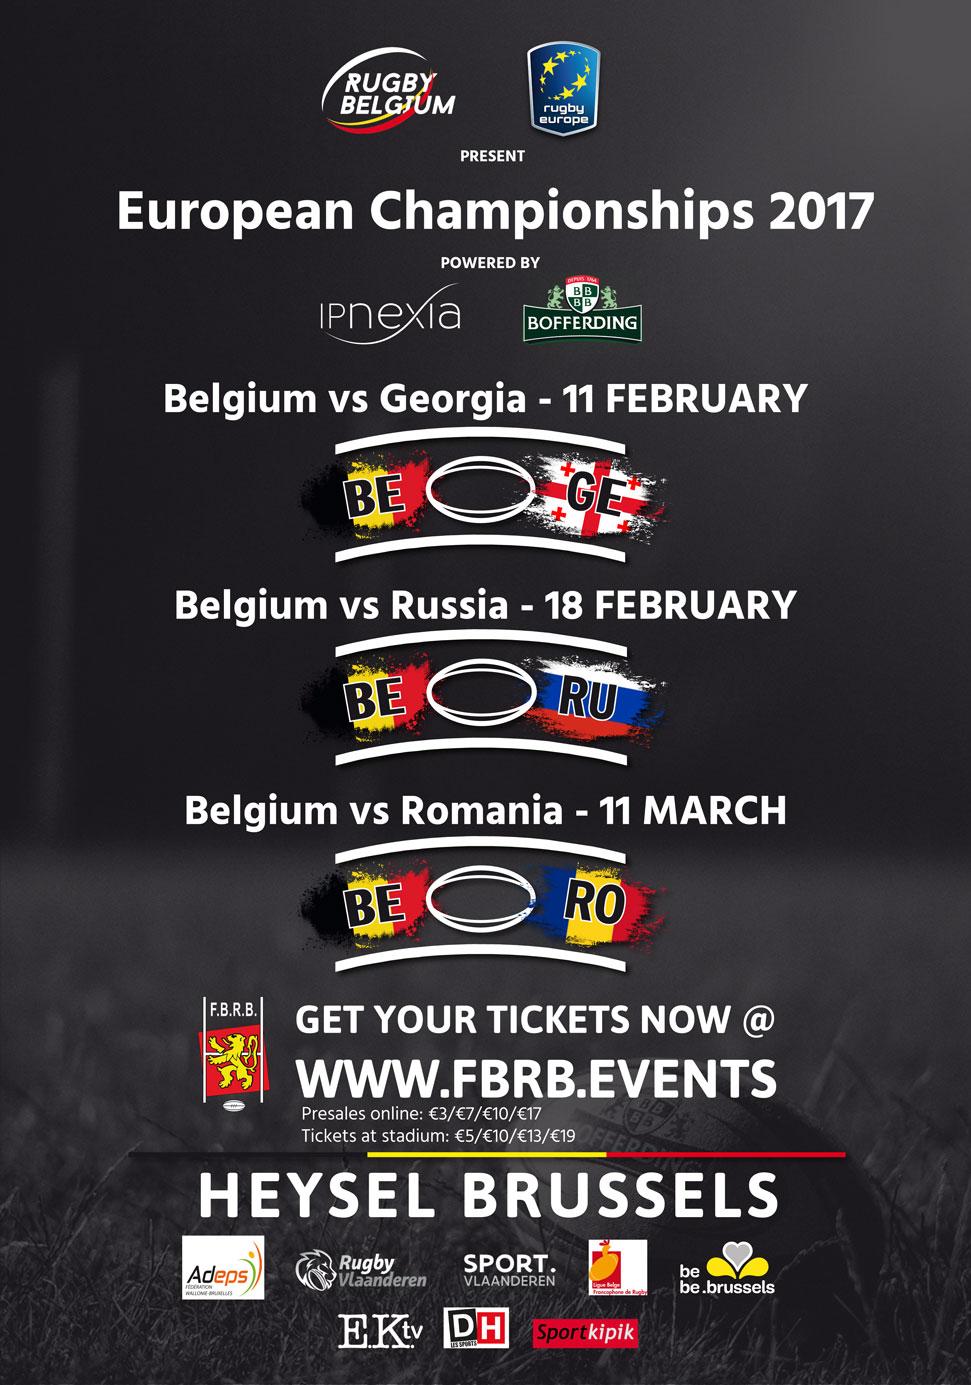 FBRB_Poster_Championchip2017_final-version